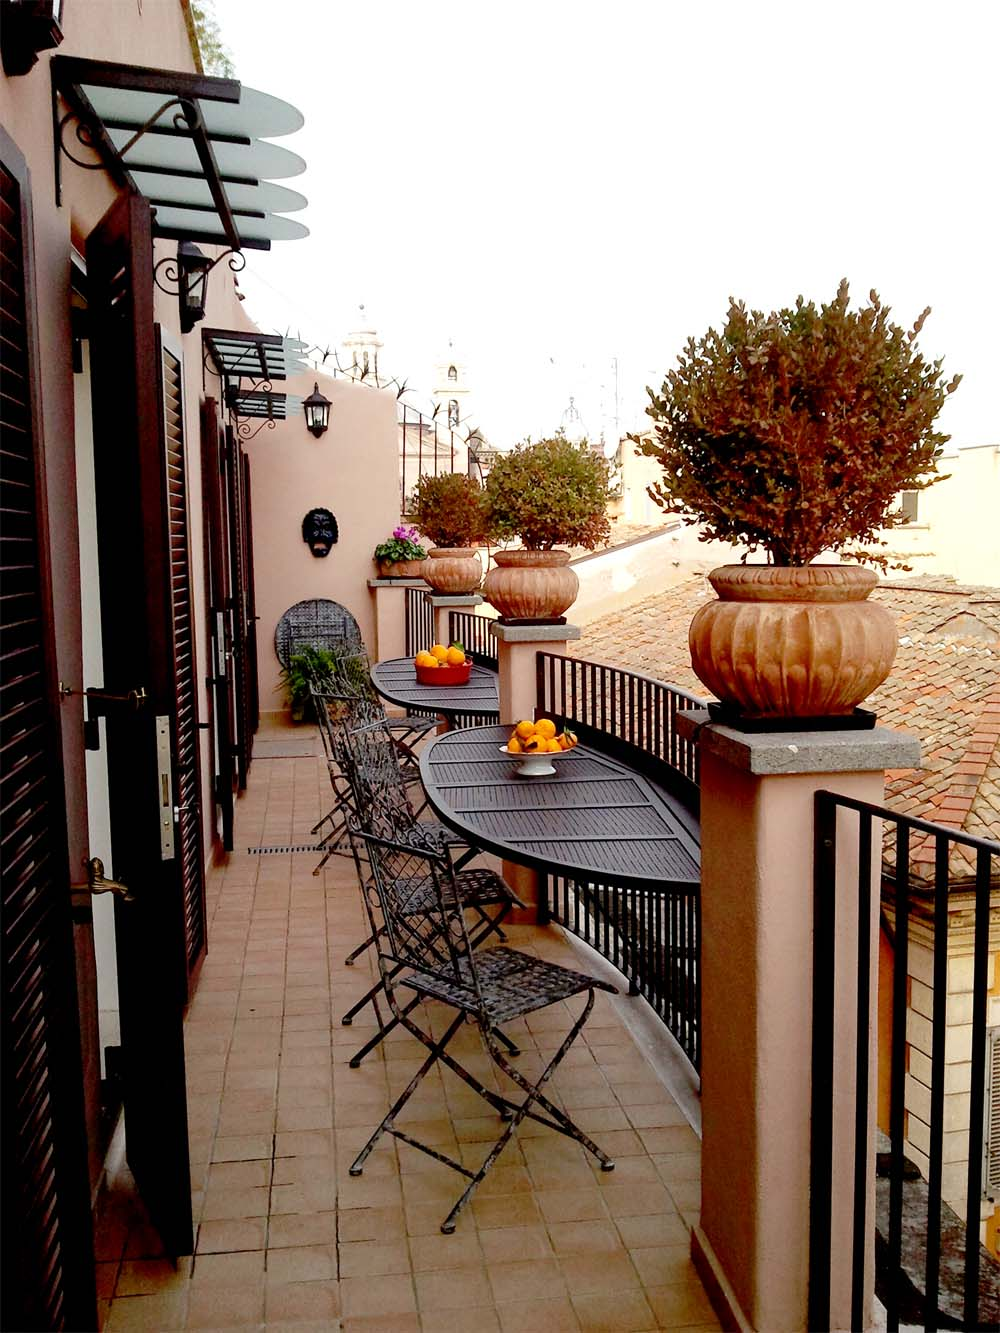 Fantastico Tavoli E Sedie Da Giardino Offerte Raccolta Di Giardino Stile